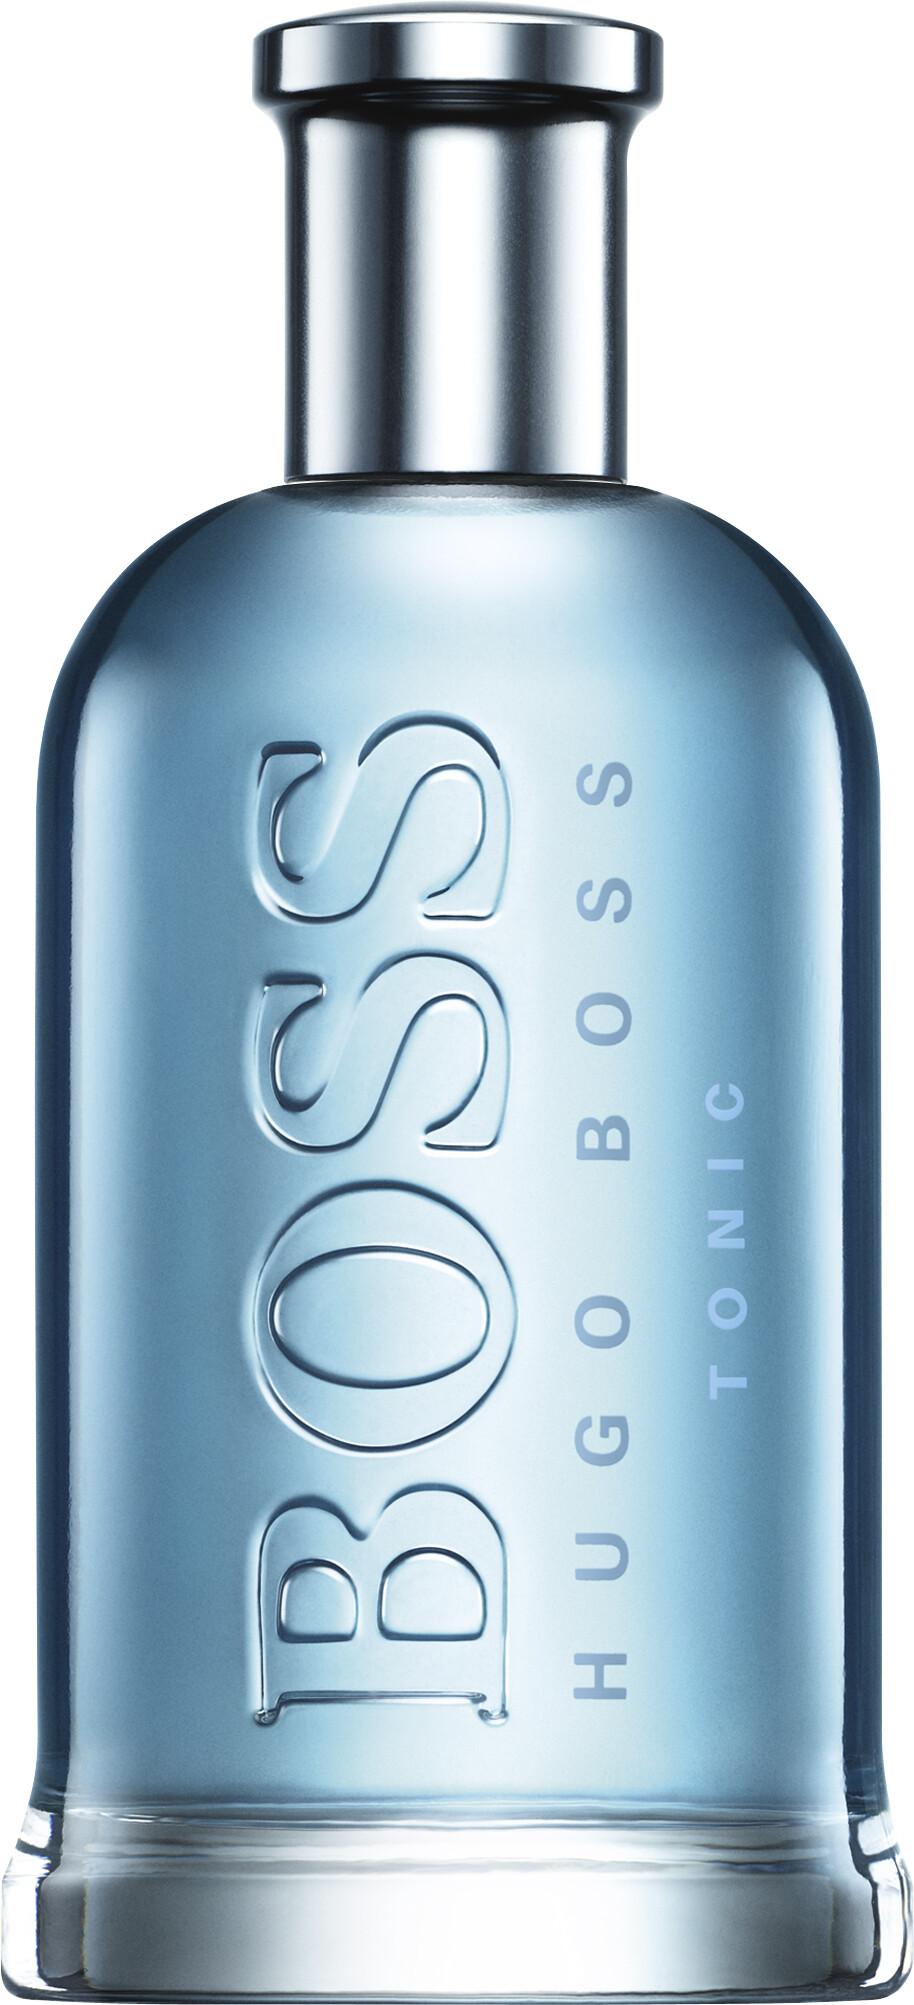 HUGO BOSS BOSS Bottled Tonic Eau de Toilette Spray